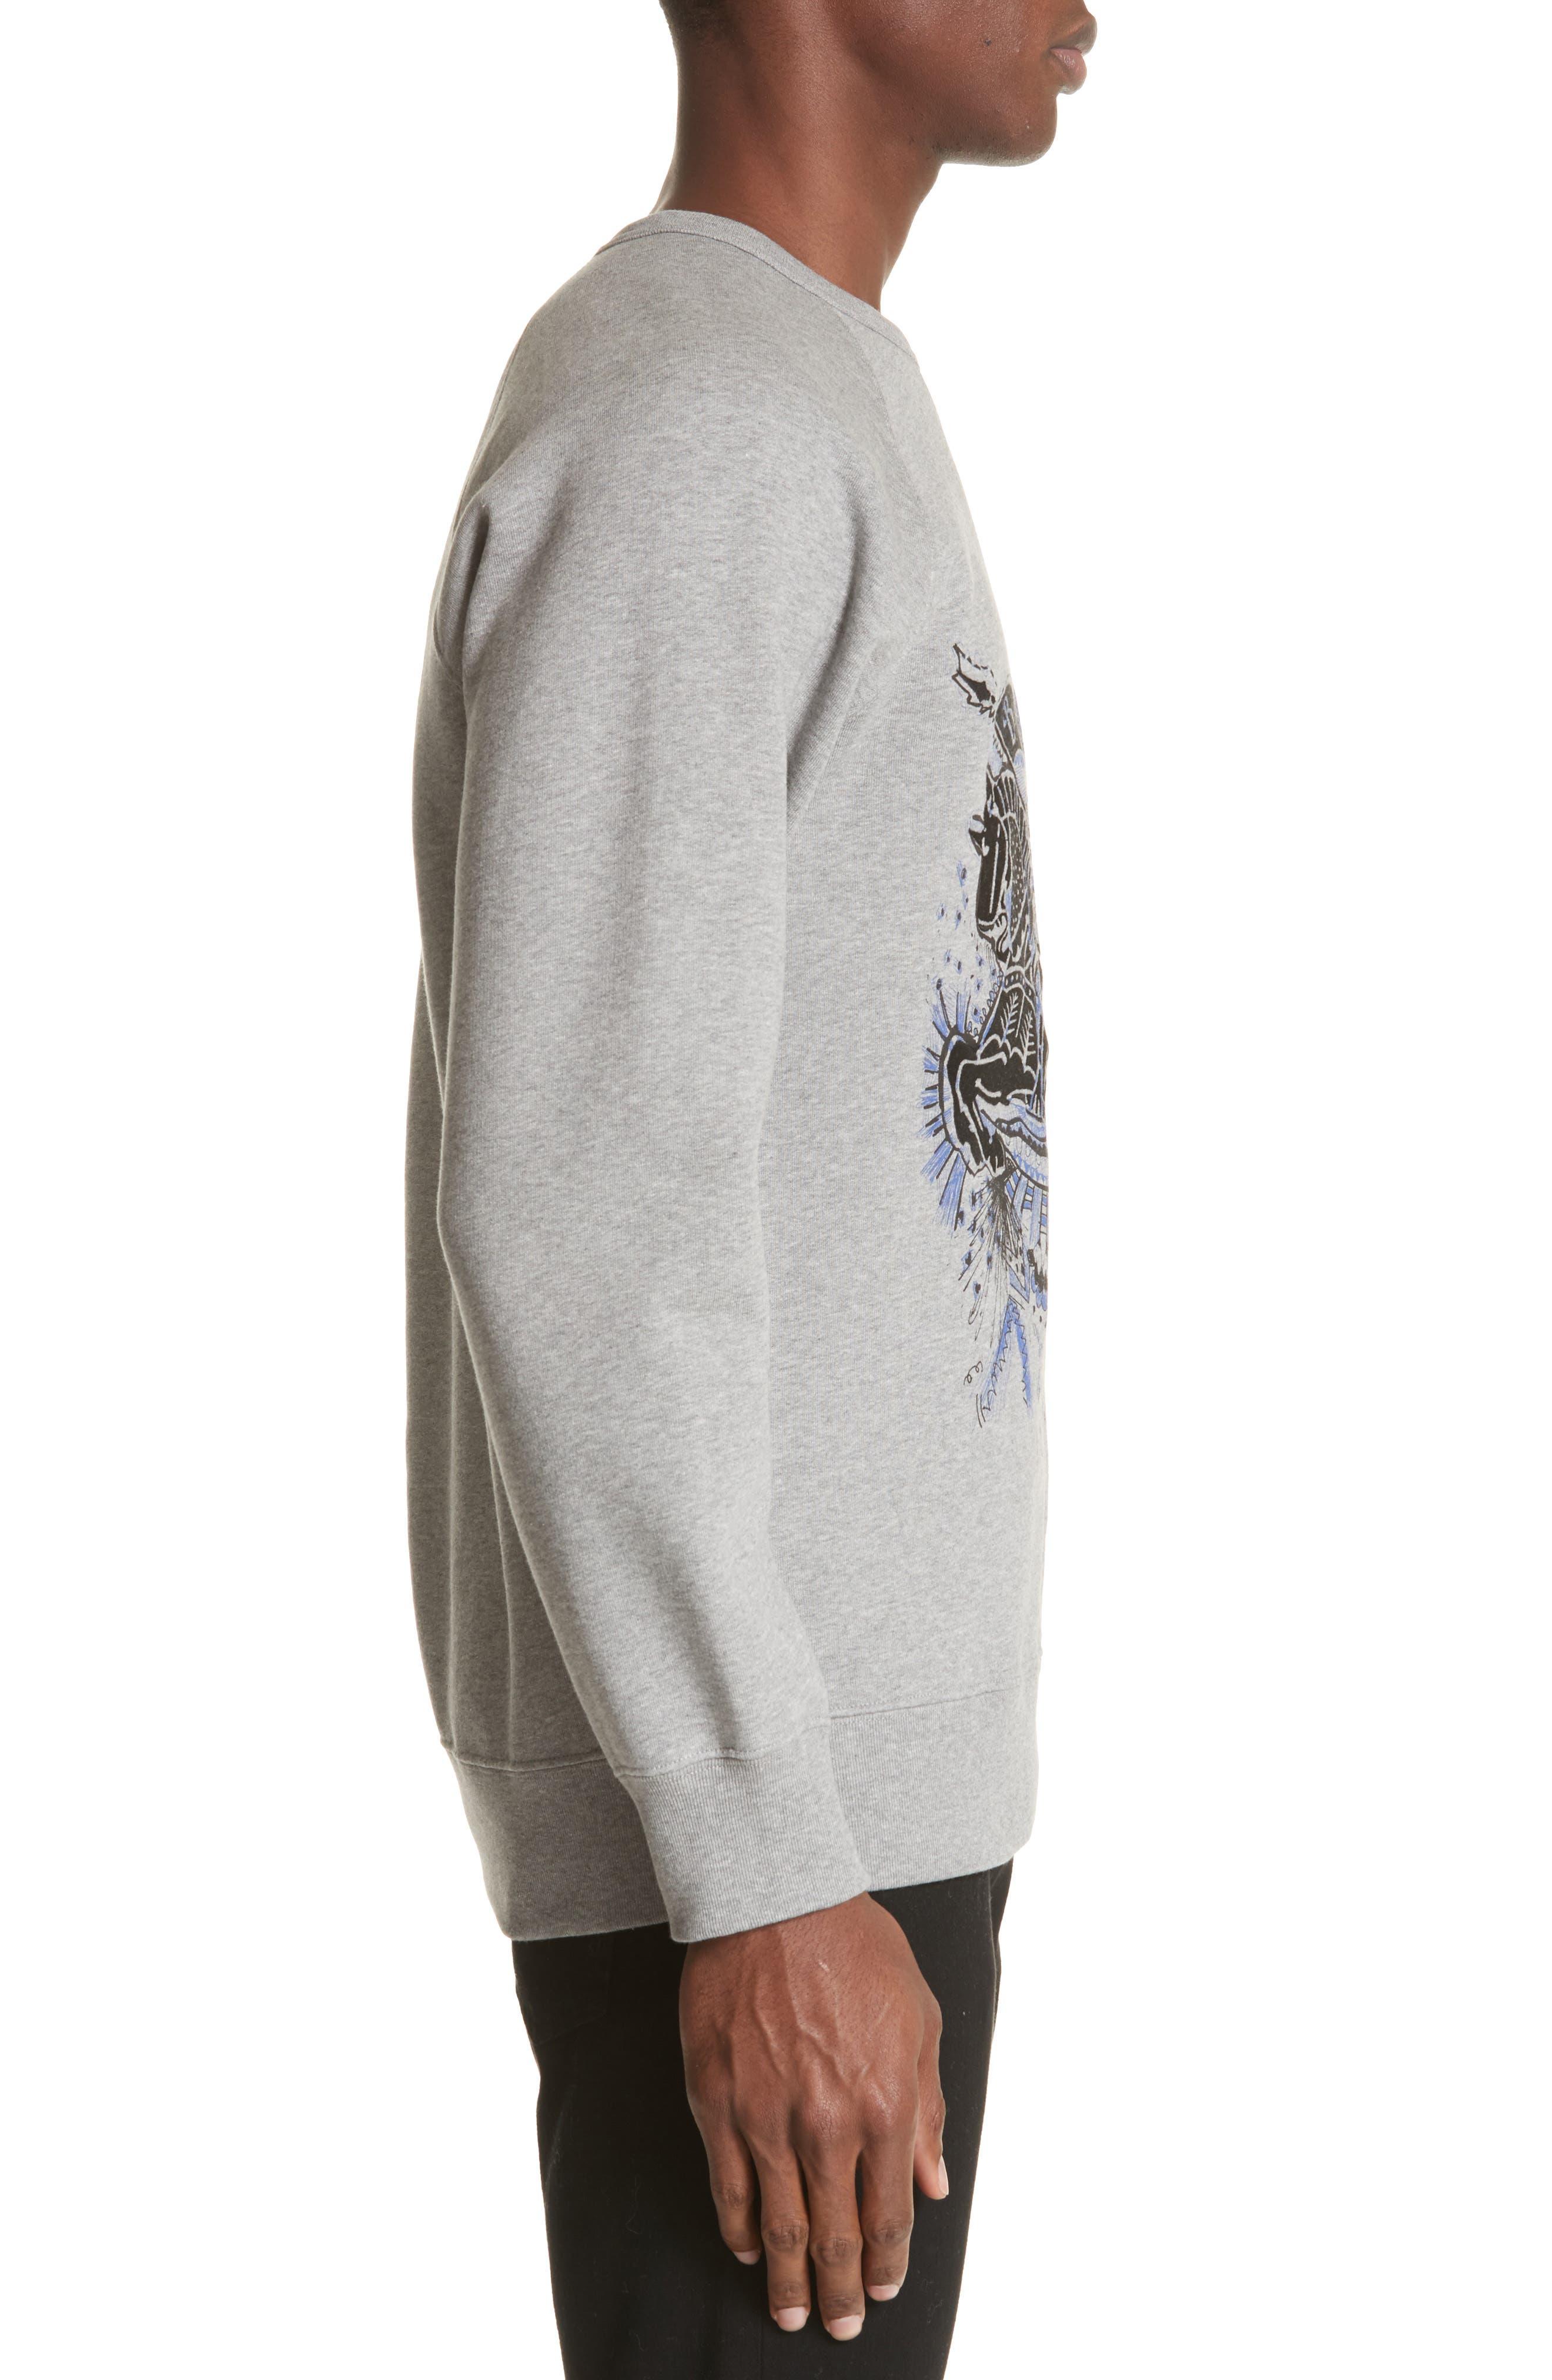 Kaneford Standard Fit Sweatshirt,                             Alternate thumbnail 3, color,                             Pale Grey Melange